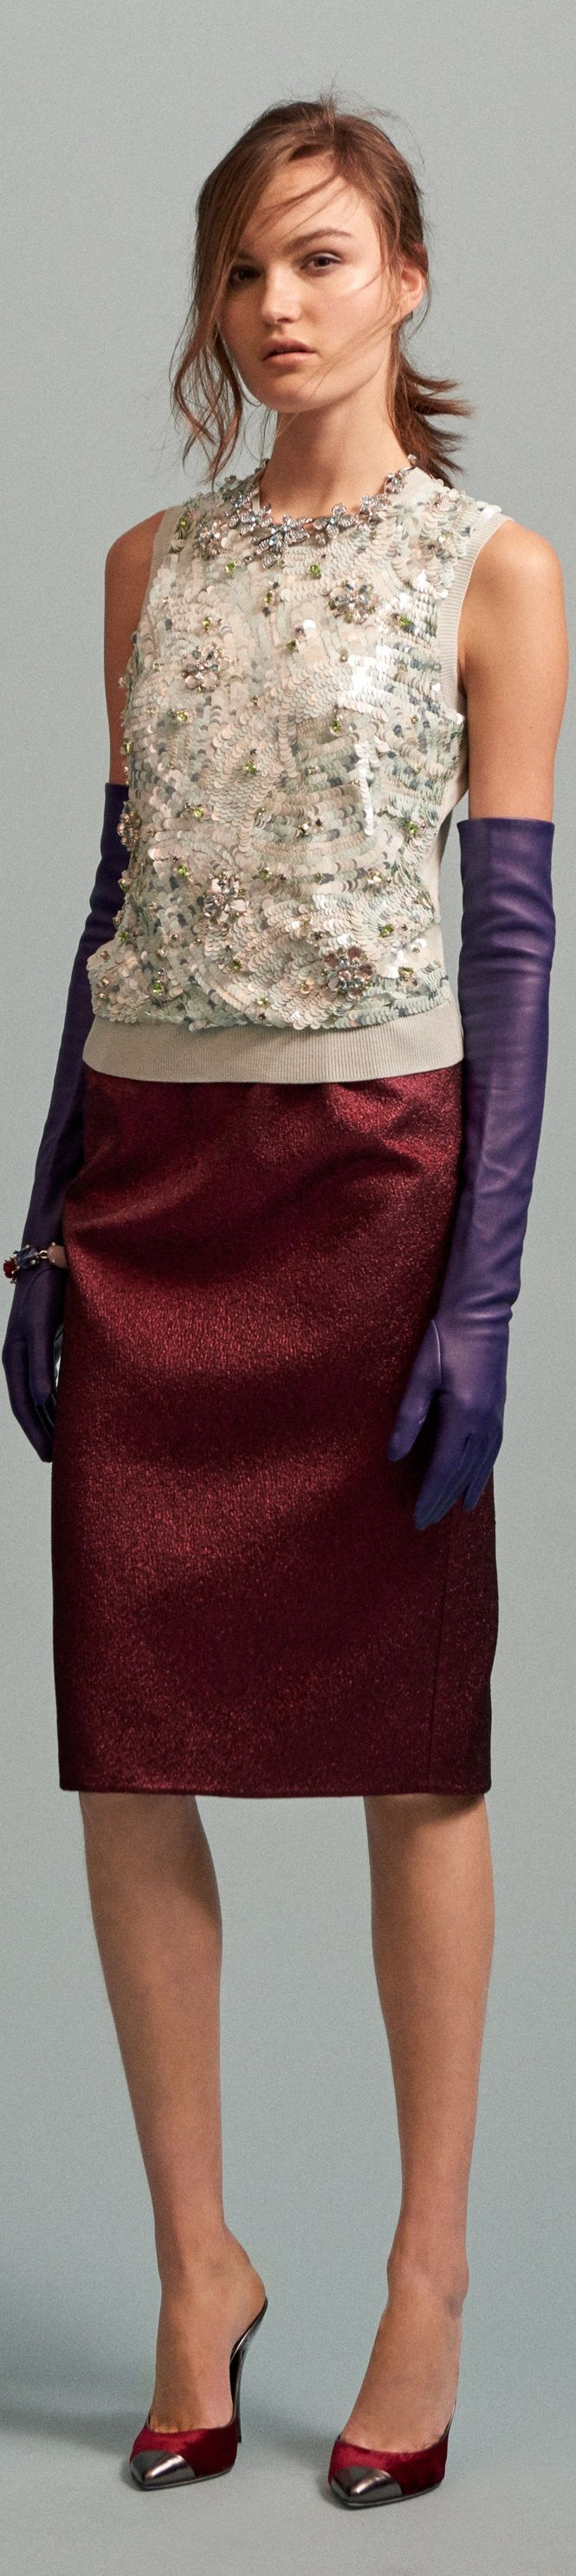 Oscar de la Renta Pre Fall 2016 vogue women fashion outfit clothing style apparel @roressclothes closet ideas